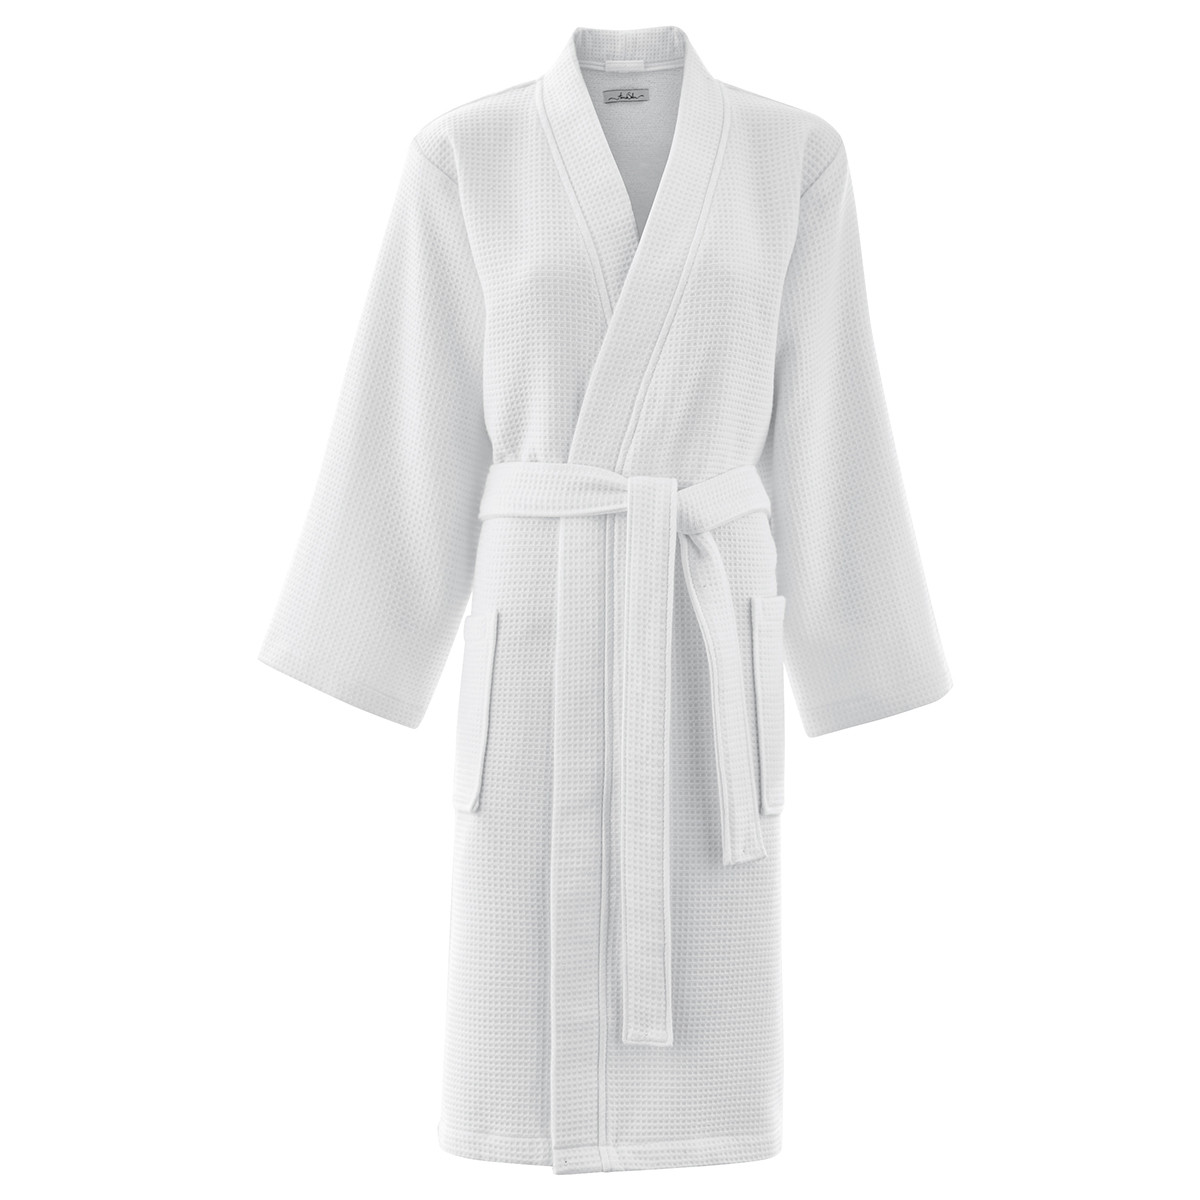 Peignoir coton s blanc